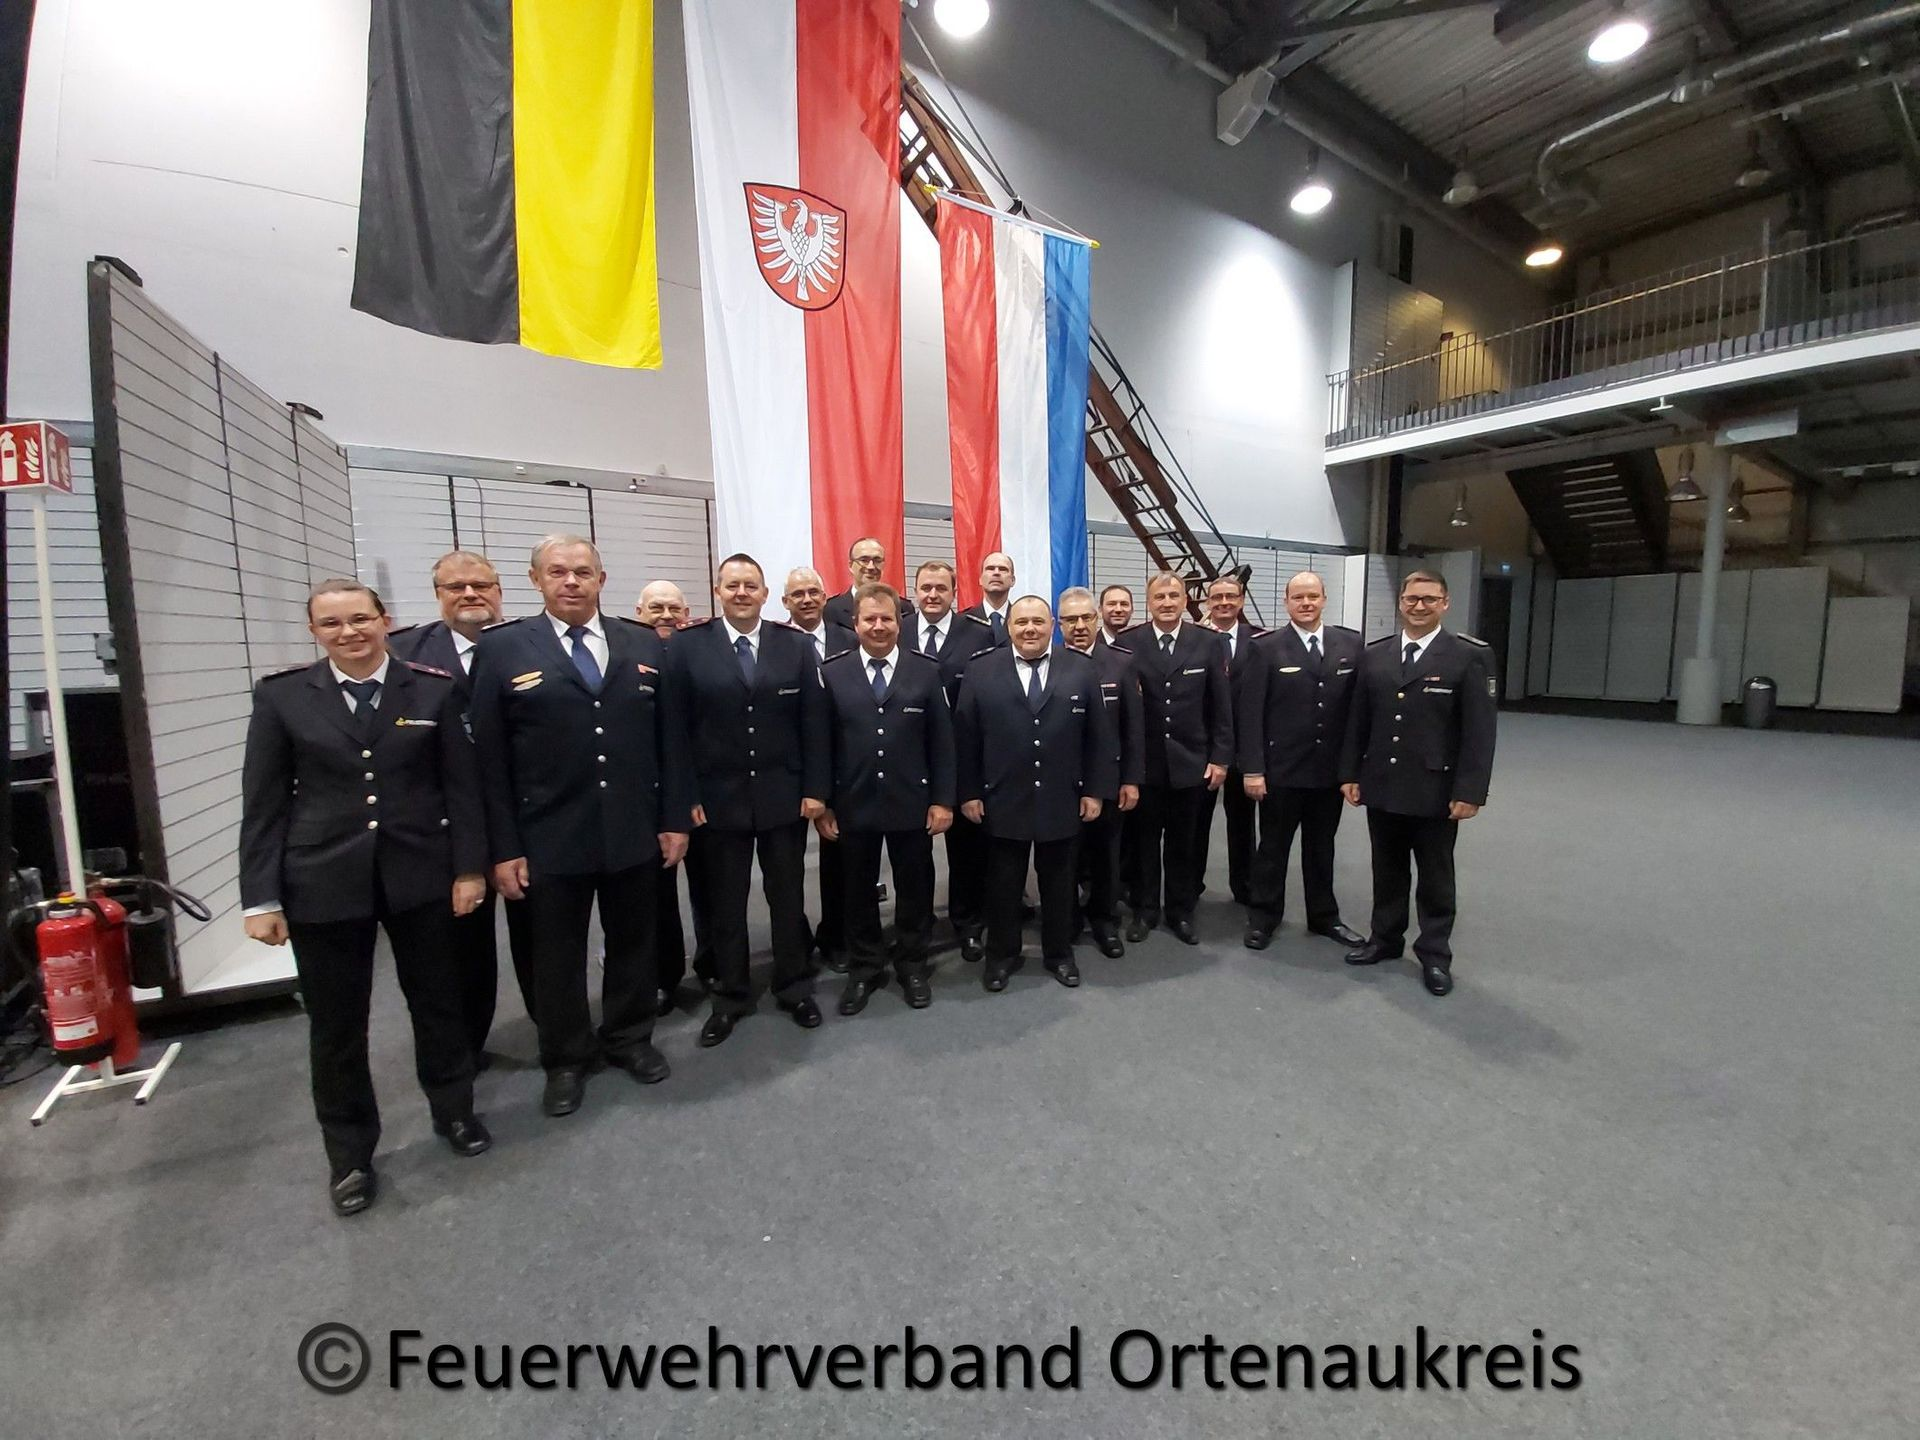 Start | Feuerwehrverband - Ortenaukreis